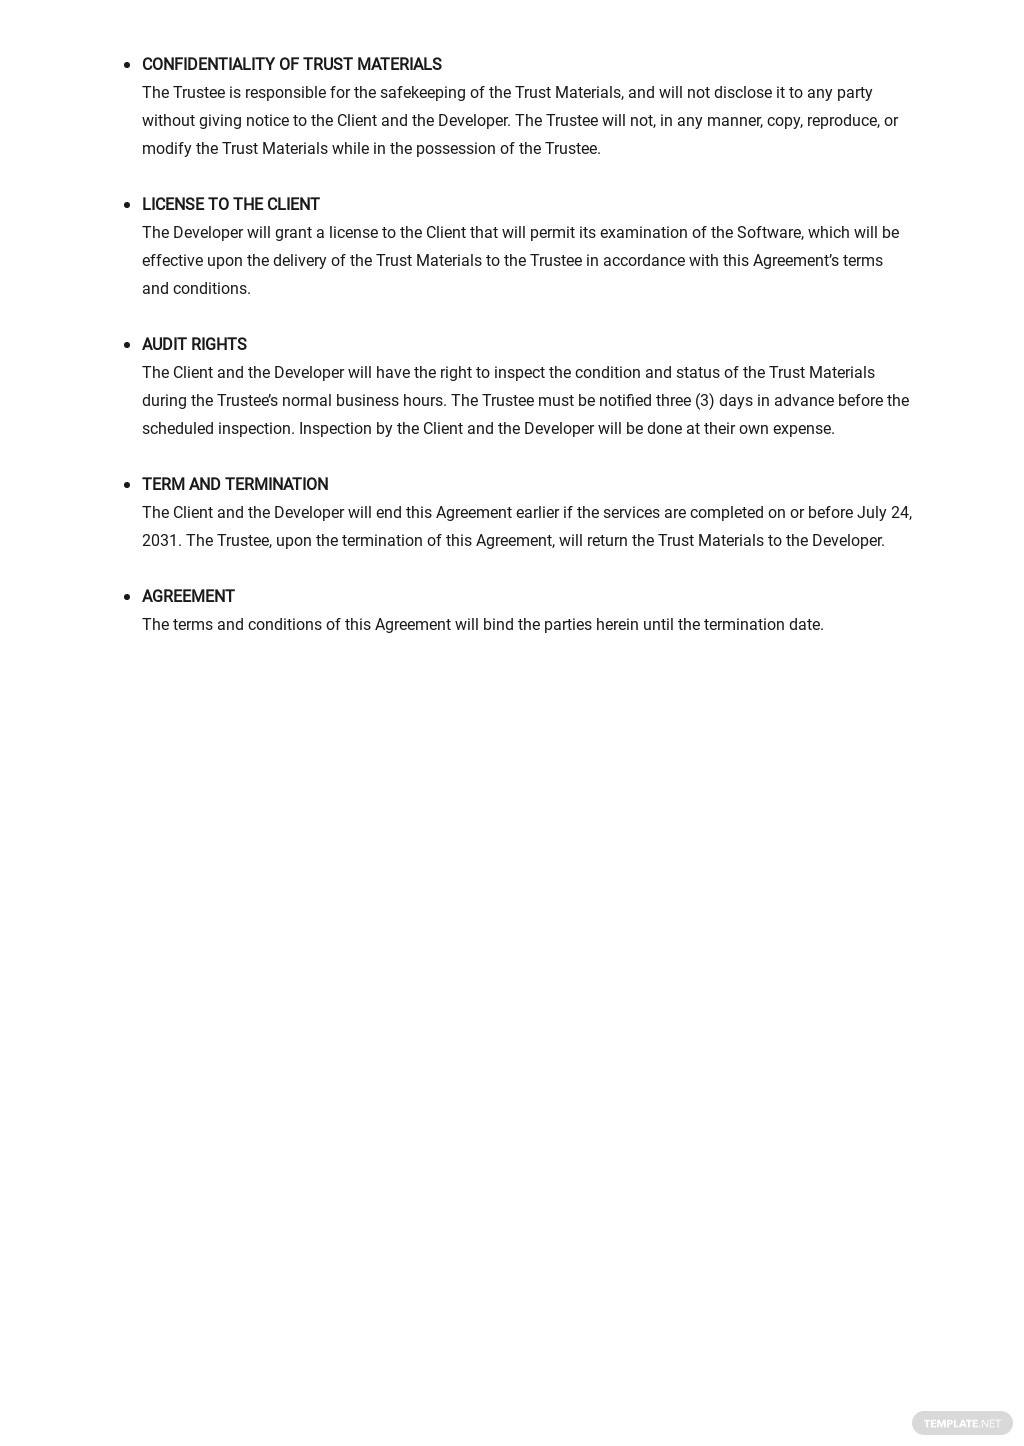 Source Code Trust Agreement Development Template 2.jpe